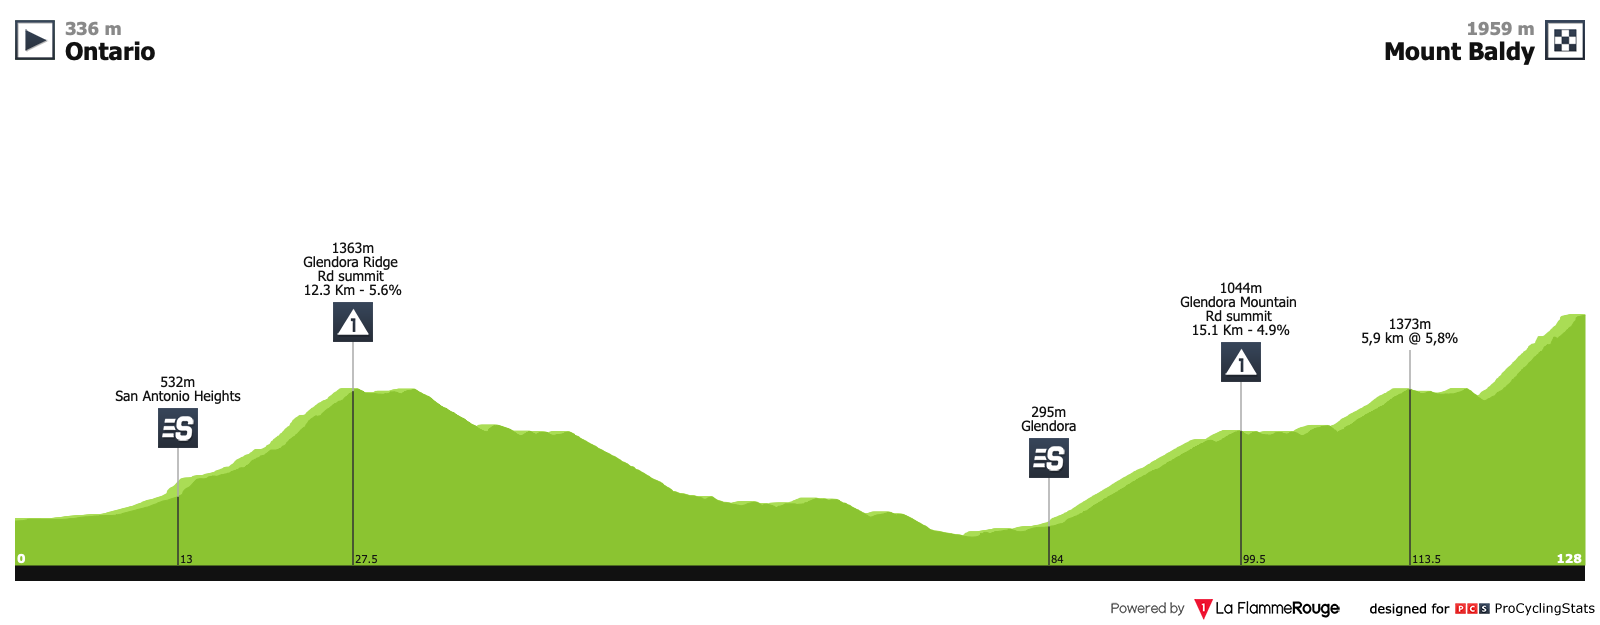 Amgen Tour of California 2019 Tour-of-california-2019-stage-6-profile-n2-8d35c0c1e5